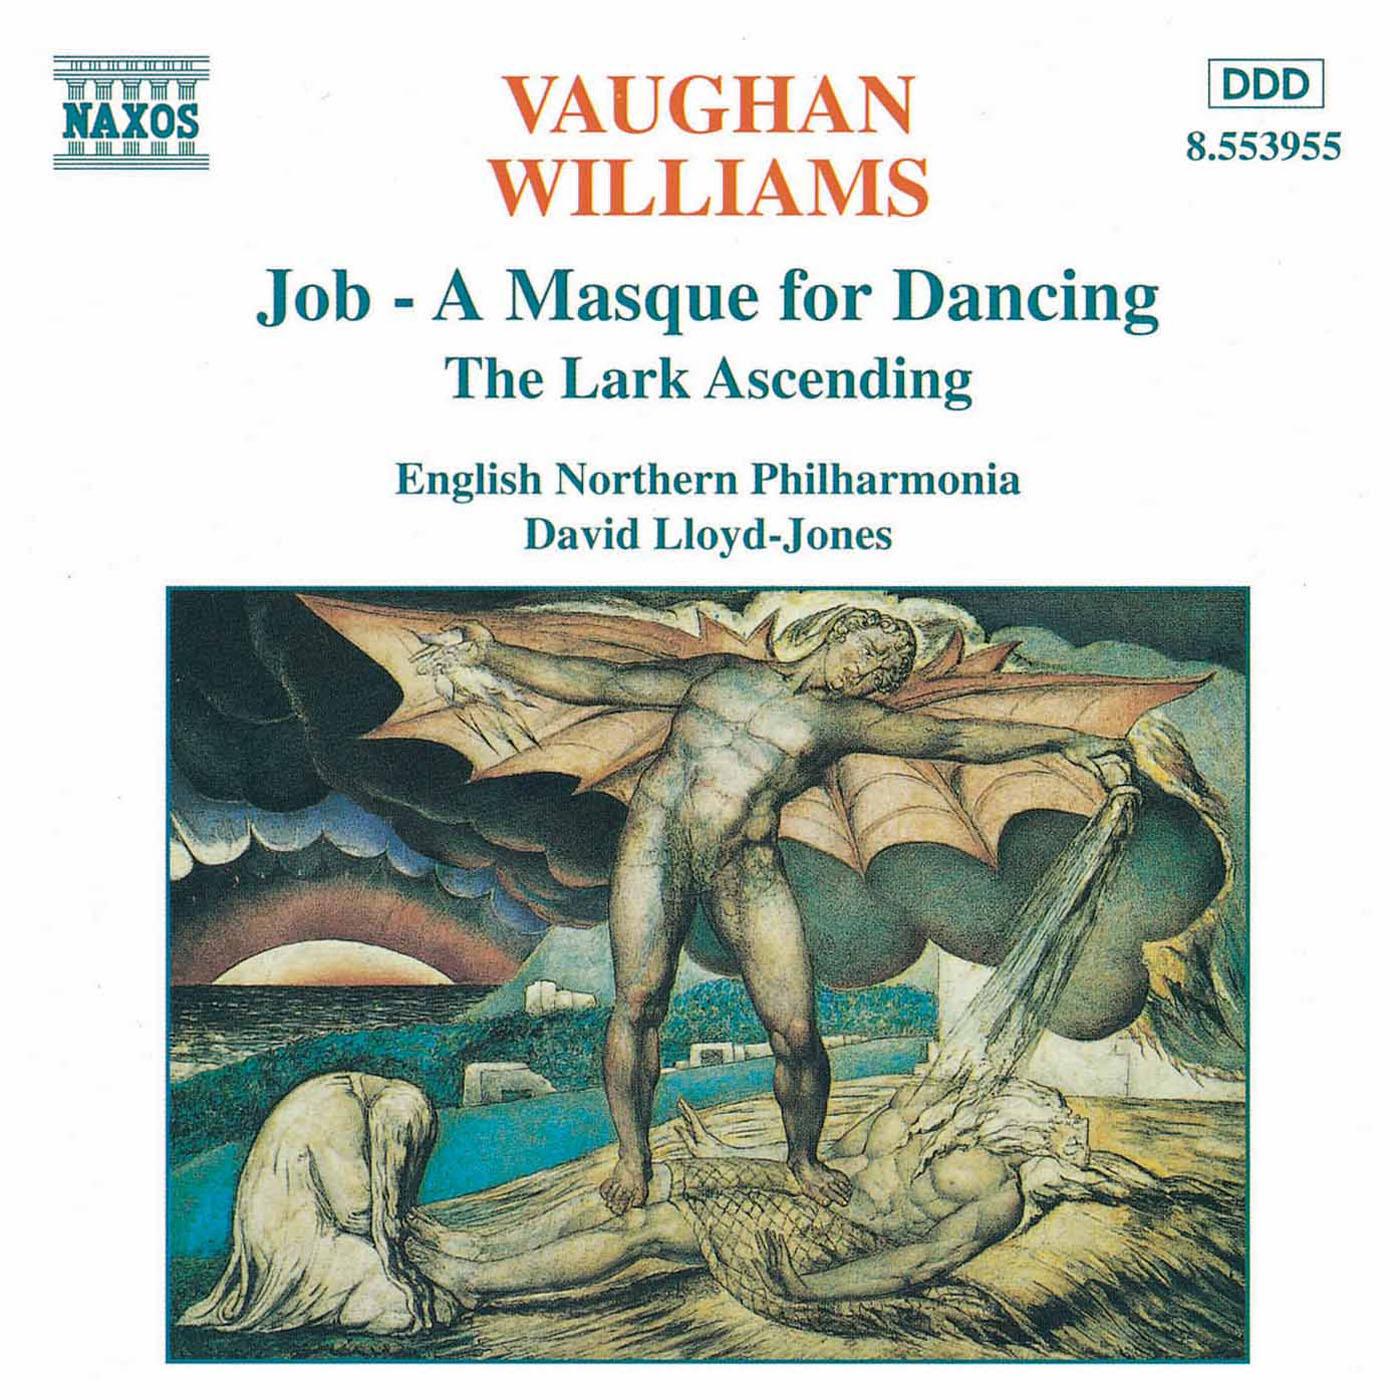 Vaughan Williams: Job - The Lark Ascending